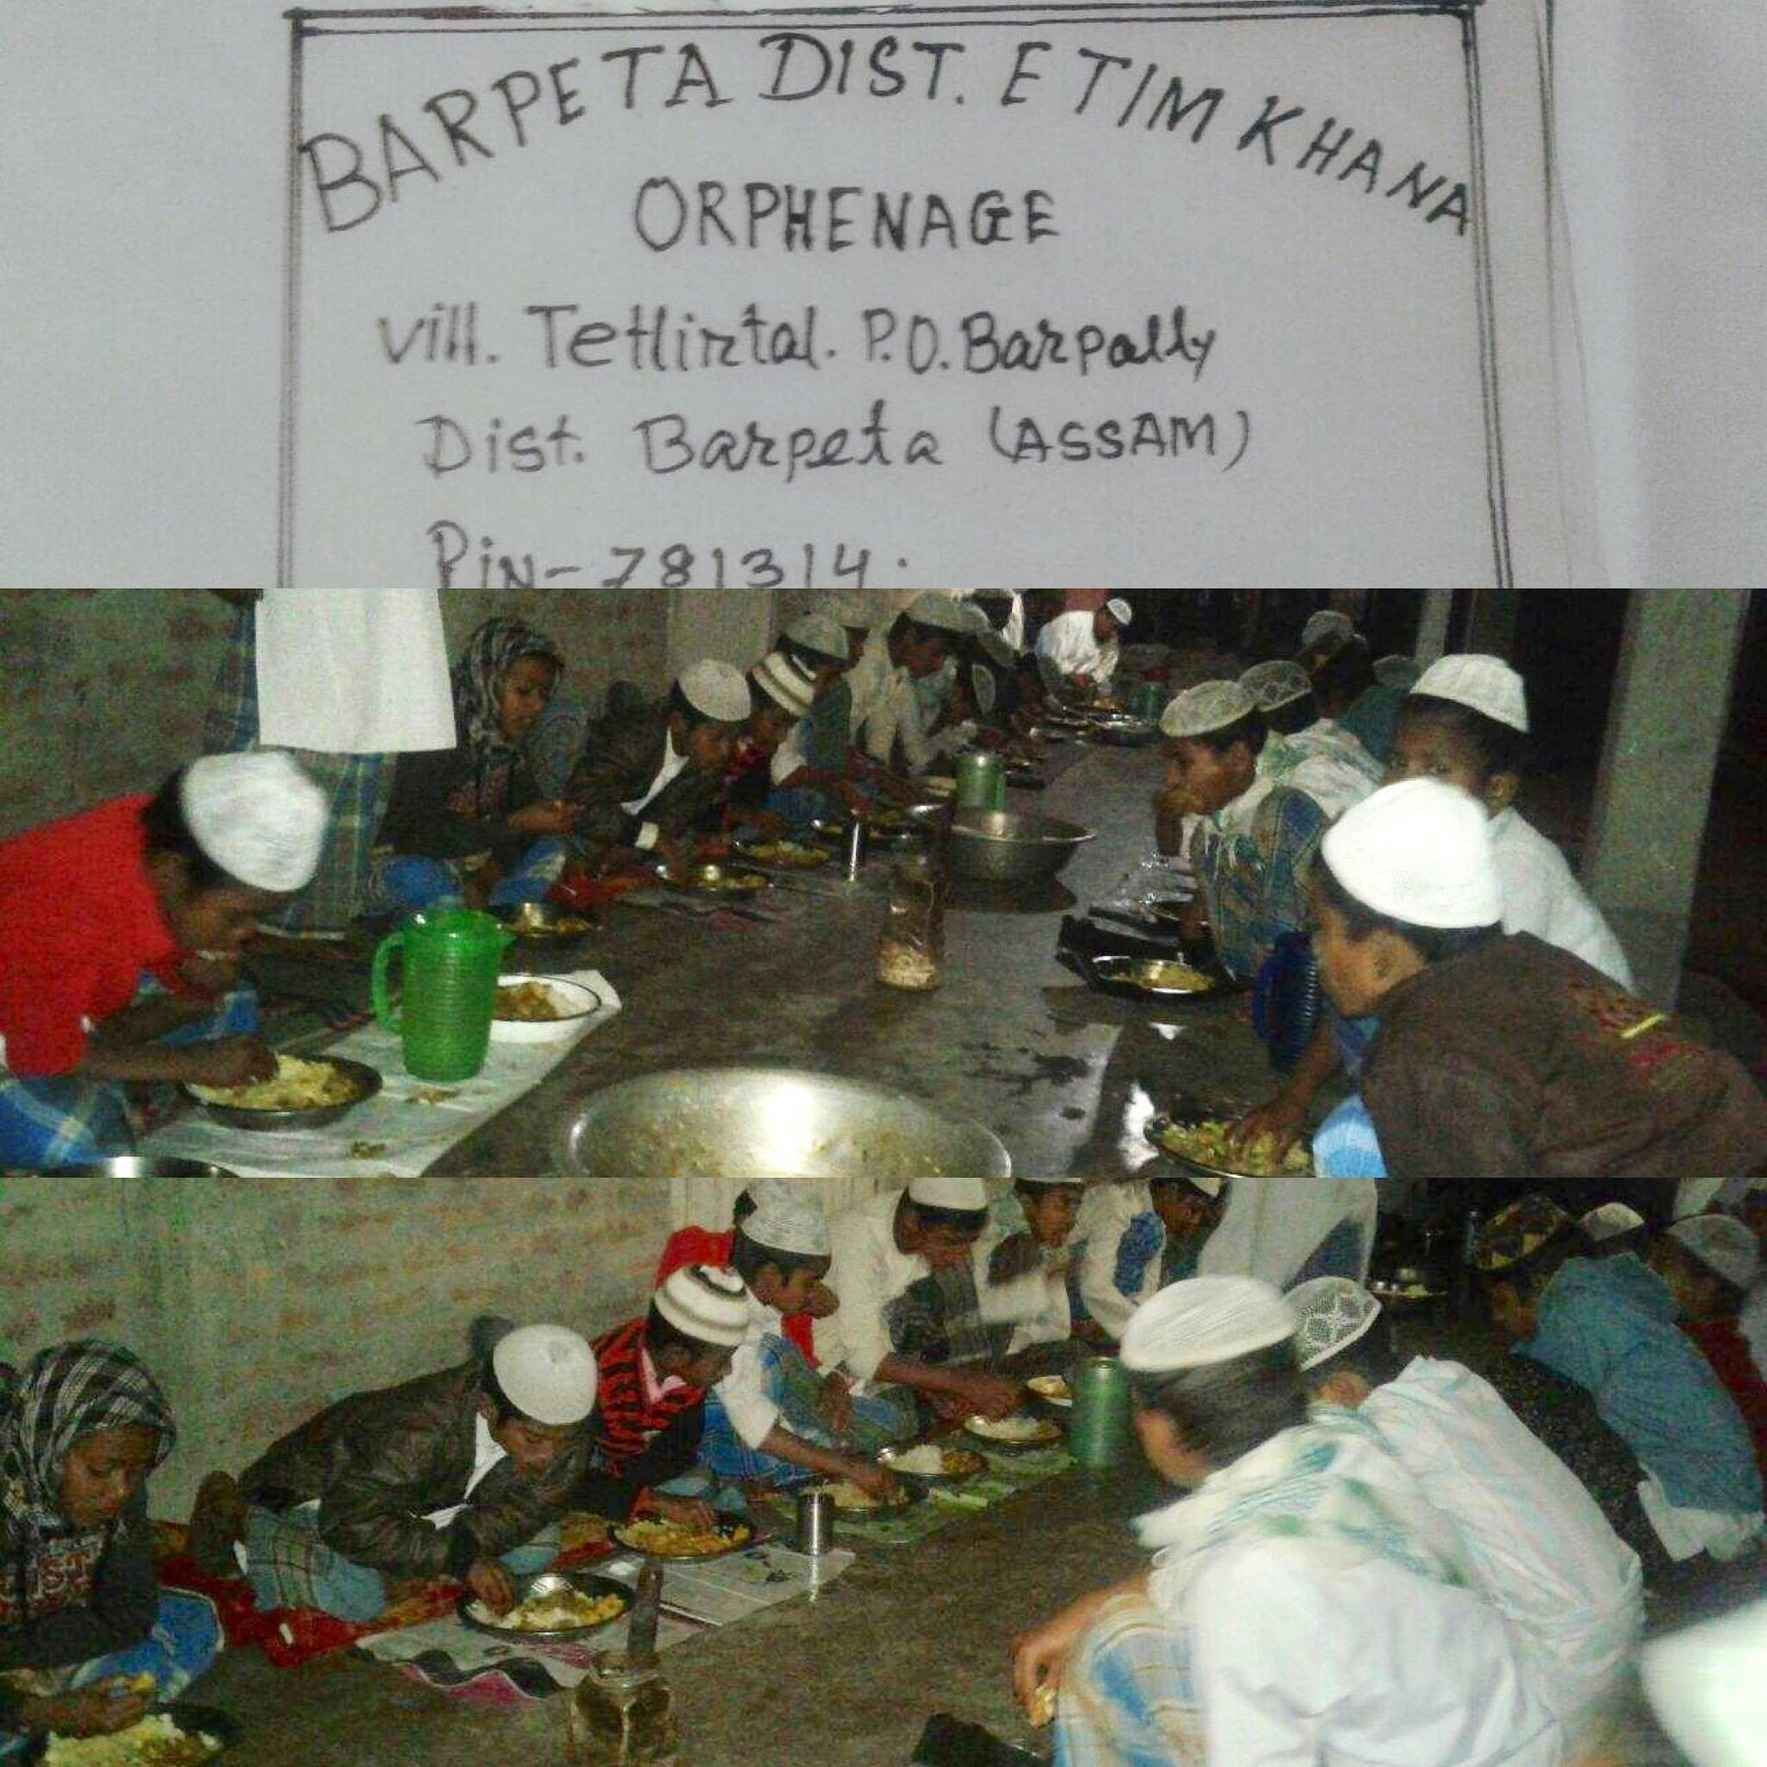 Kaffarah/Fidyah/Zakat for Orphanage in Assam, India image